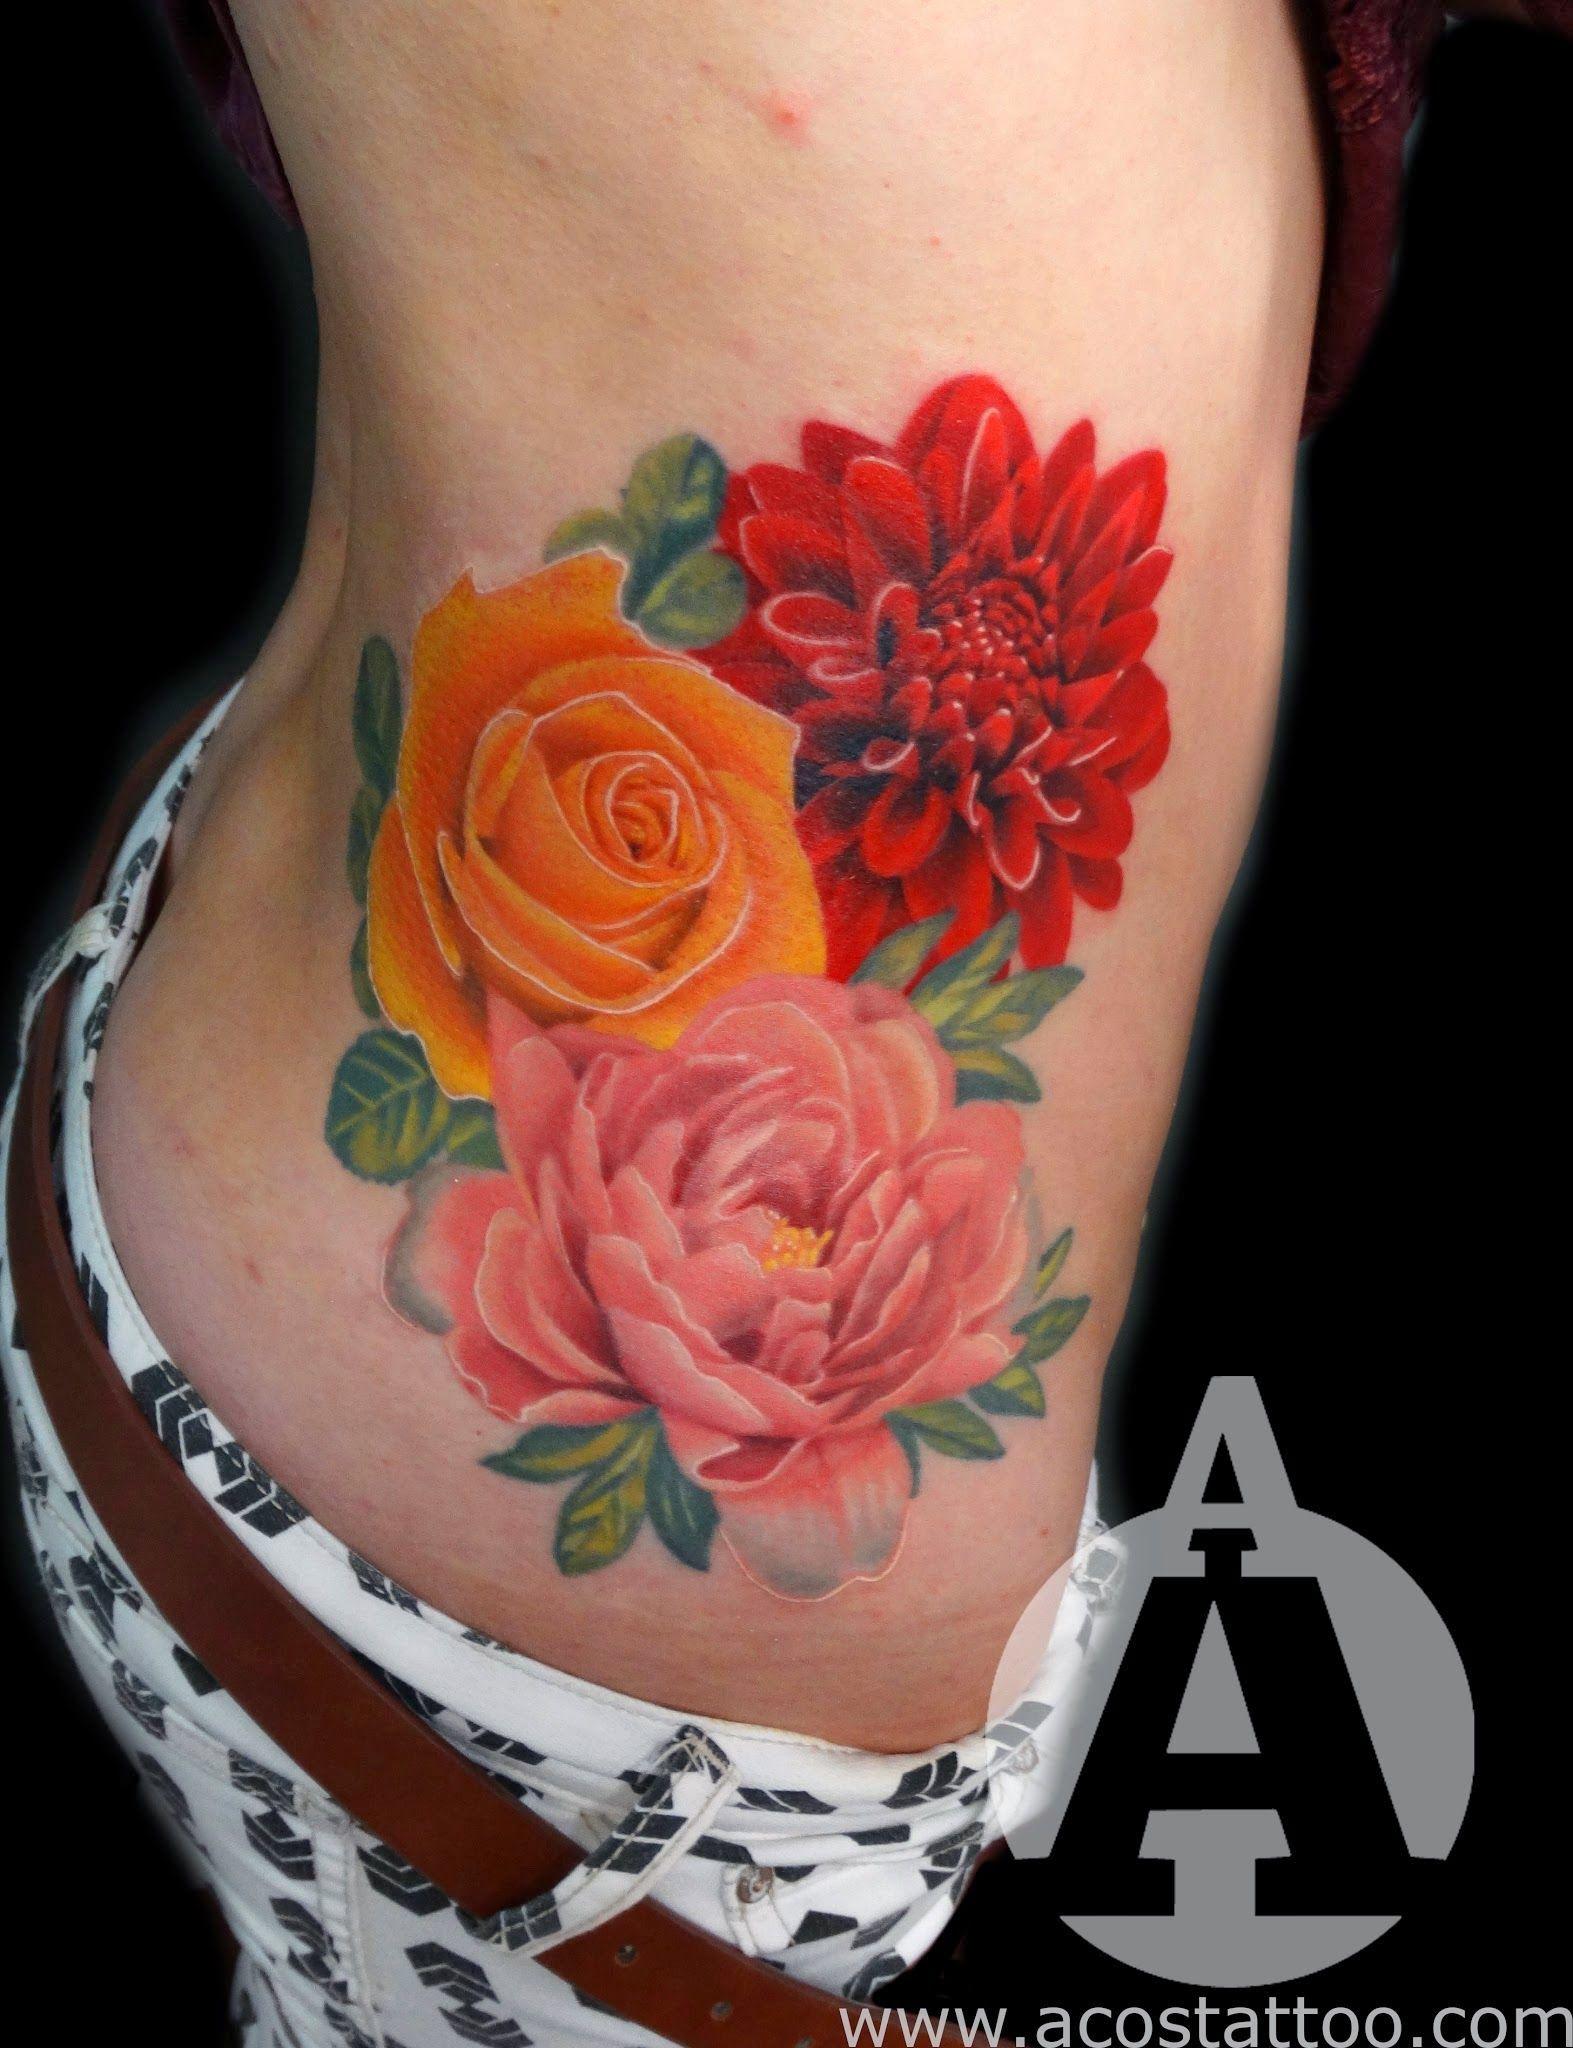 Watercolor tattoo artists in houston texas - Andr S Acosta Tattoo Artist Houston Tx